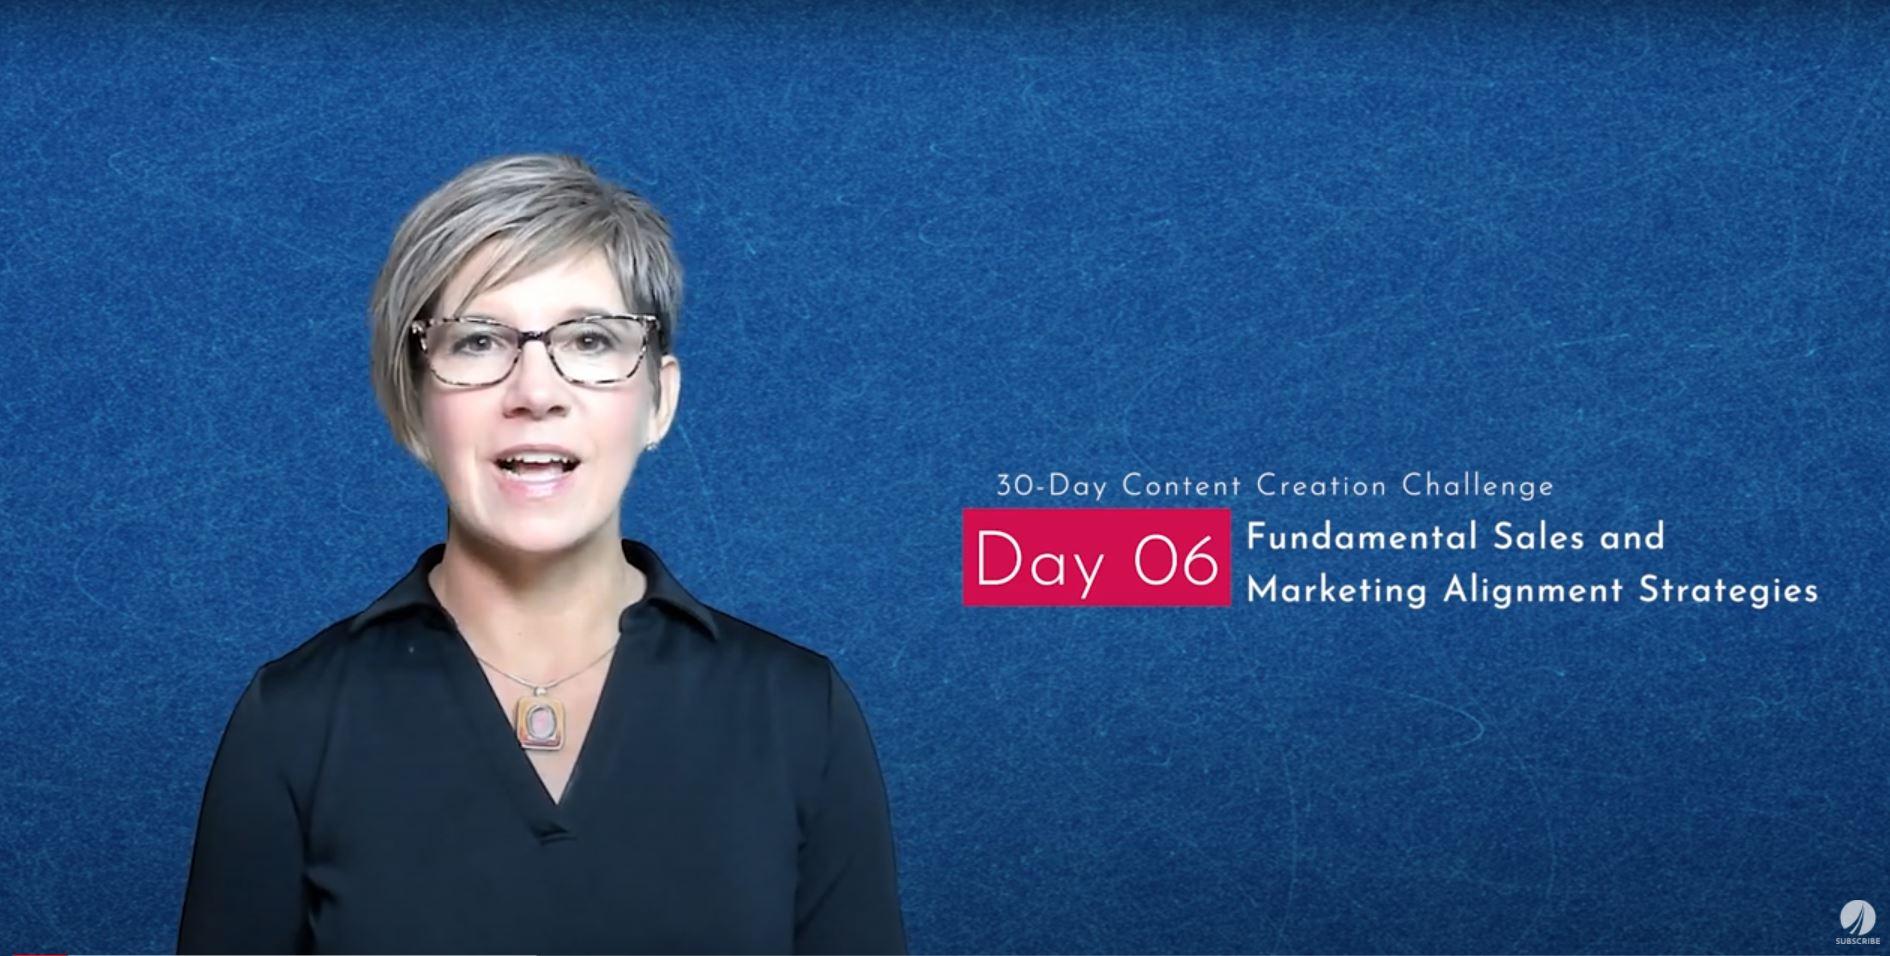 Read: Fundamental Sales and Marketing Alignment Strategies